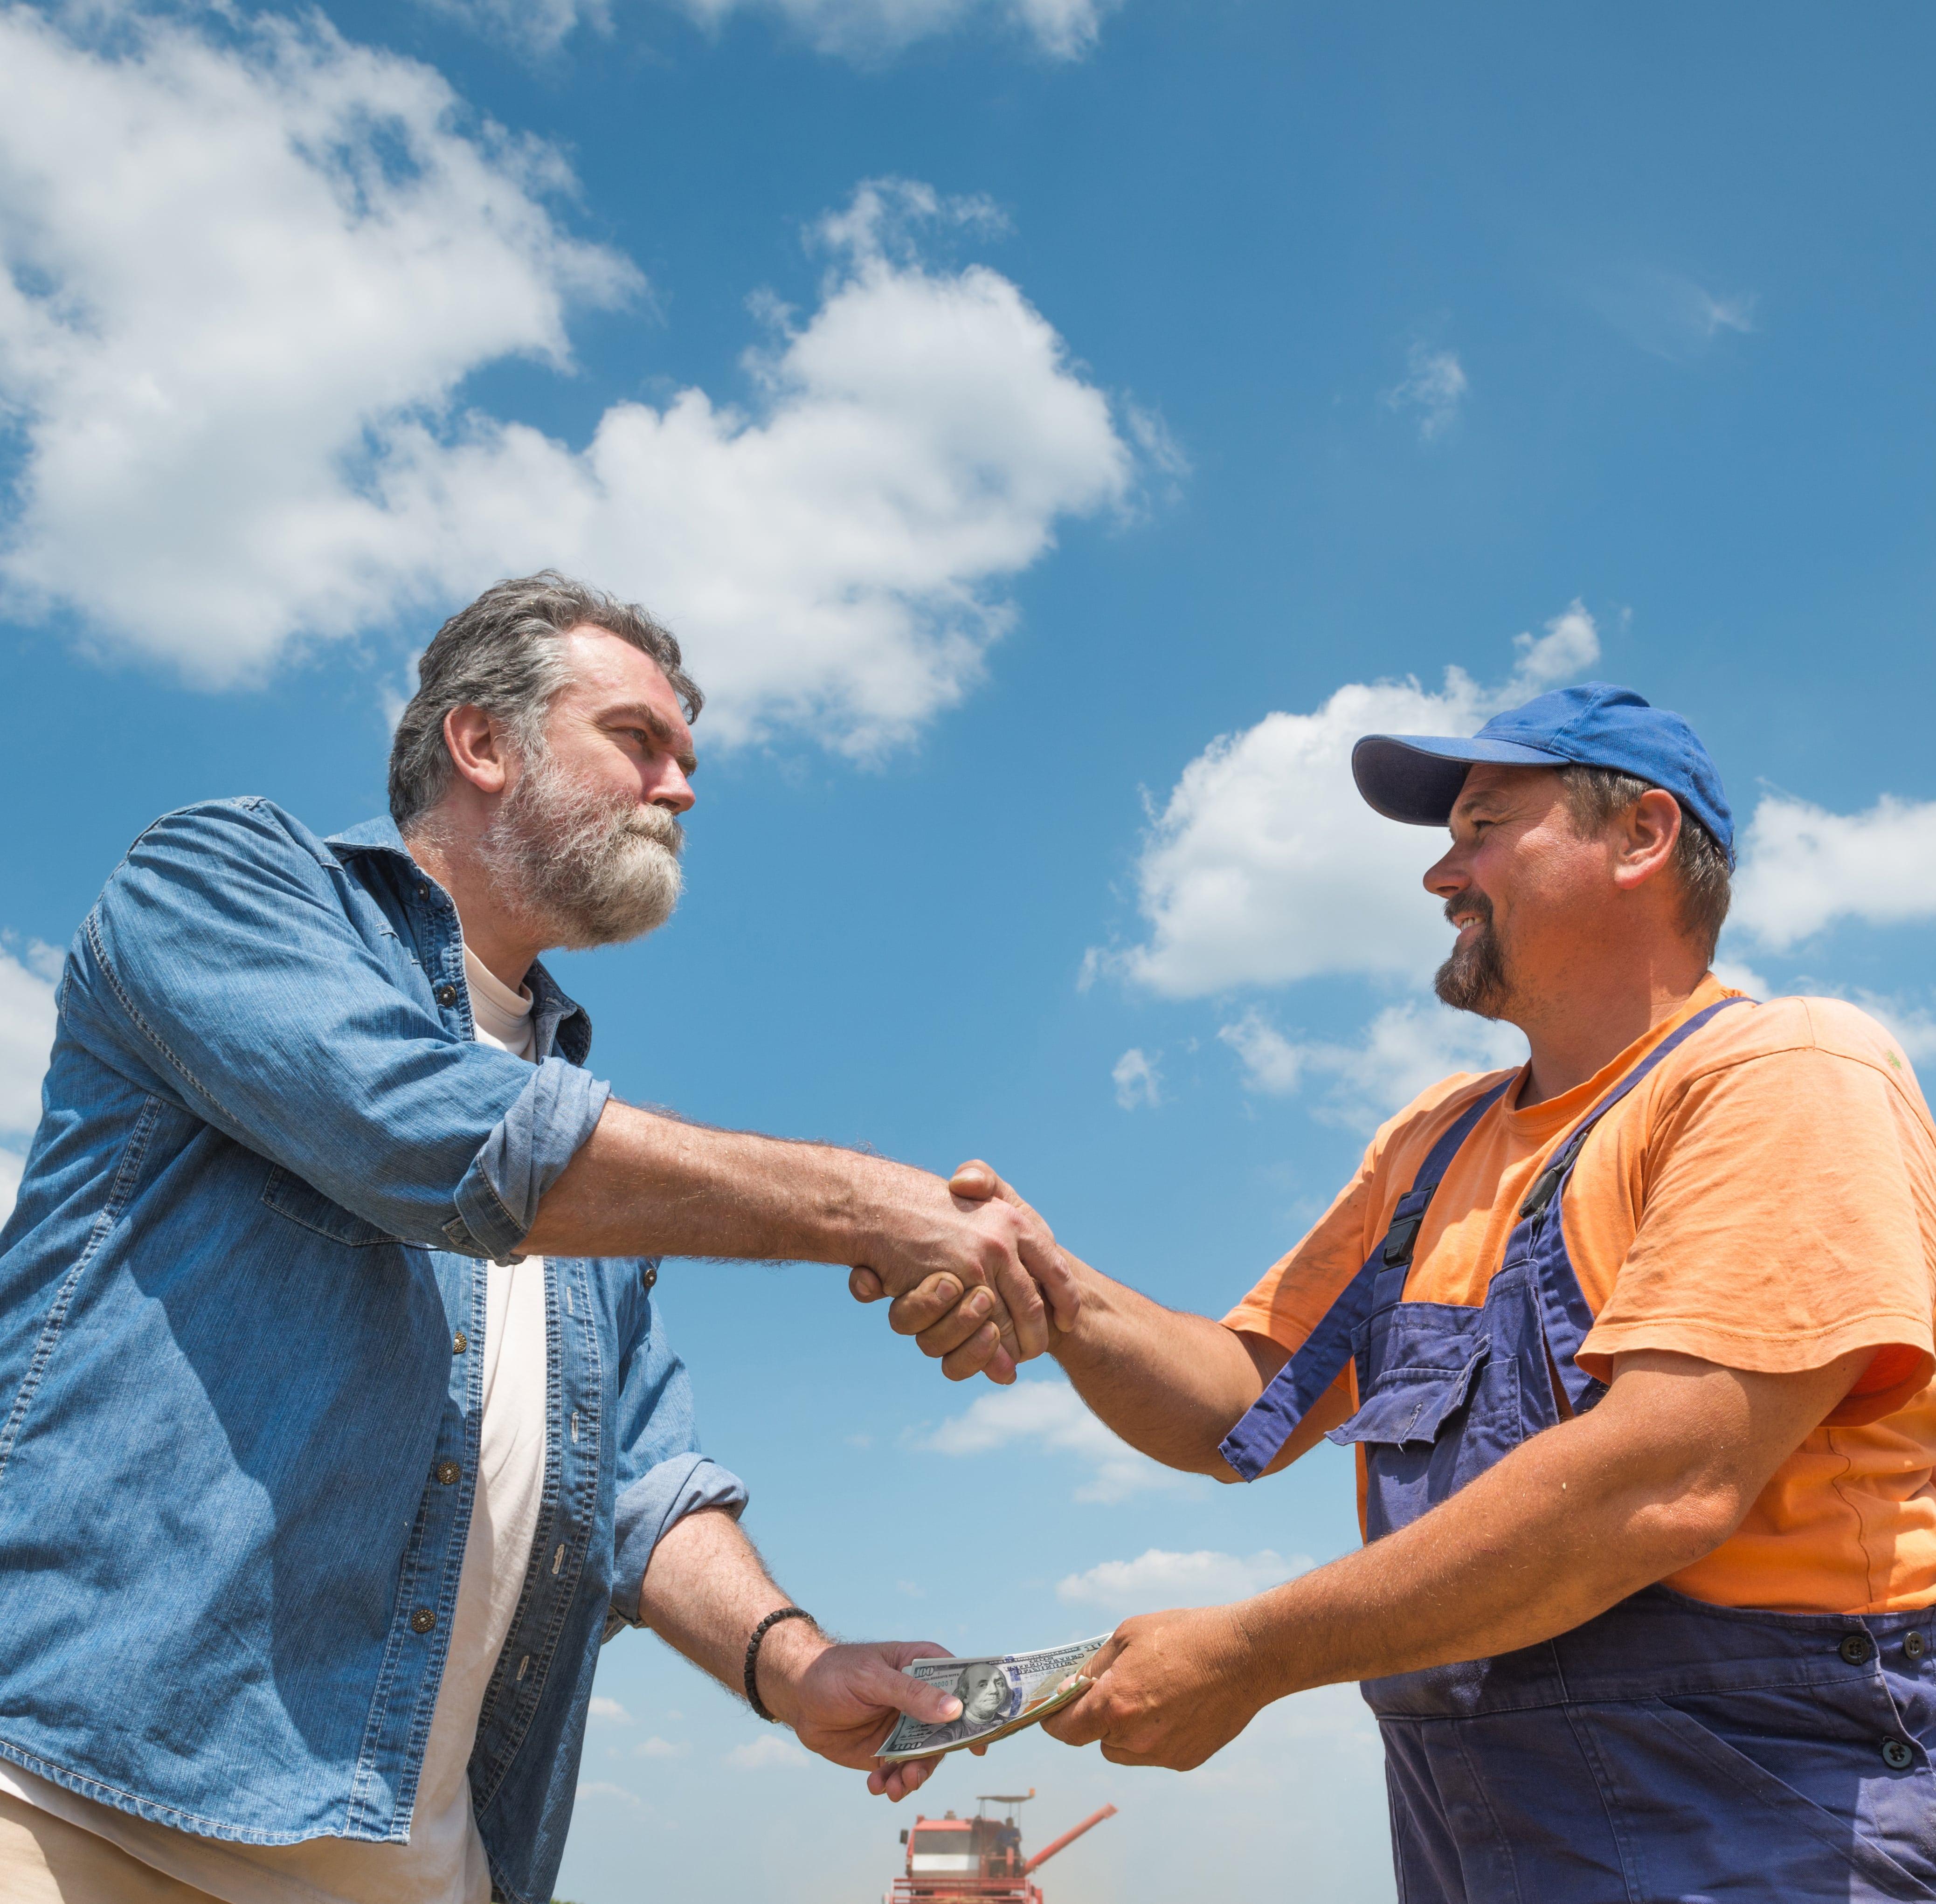 farmers strike a deal for sesame seeds